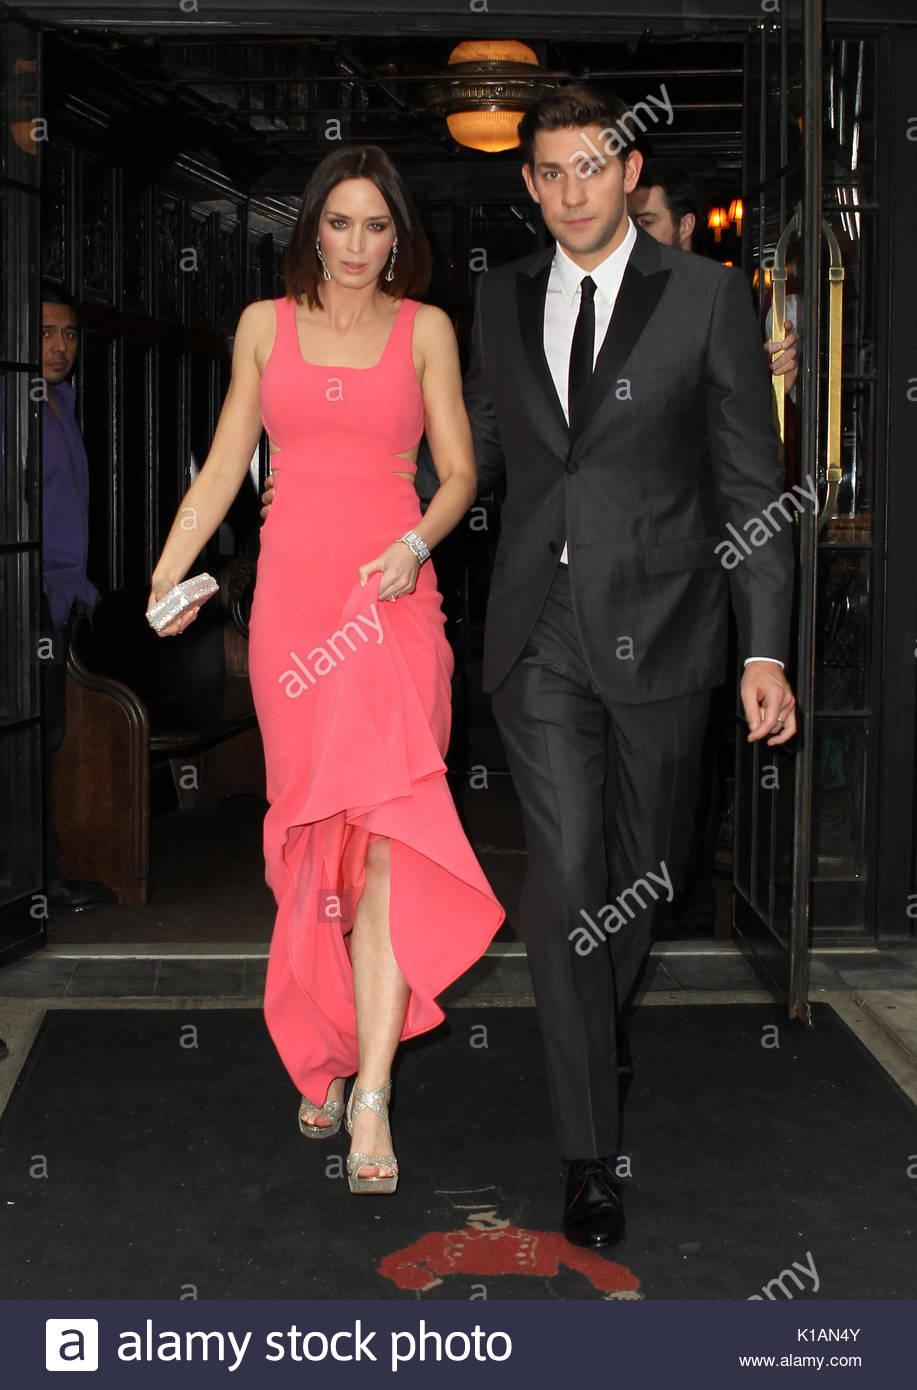 Emily Blunt And John Krasinski Actress Emily Blunt Wearing A